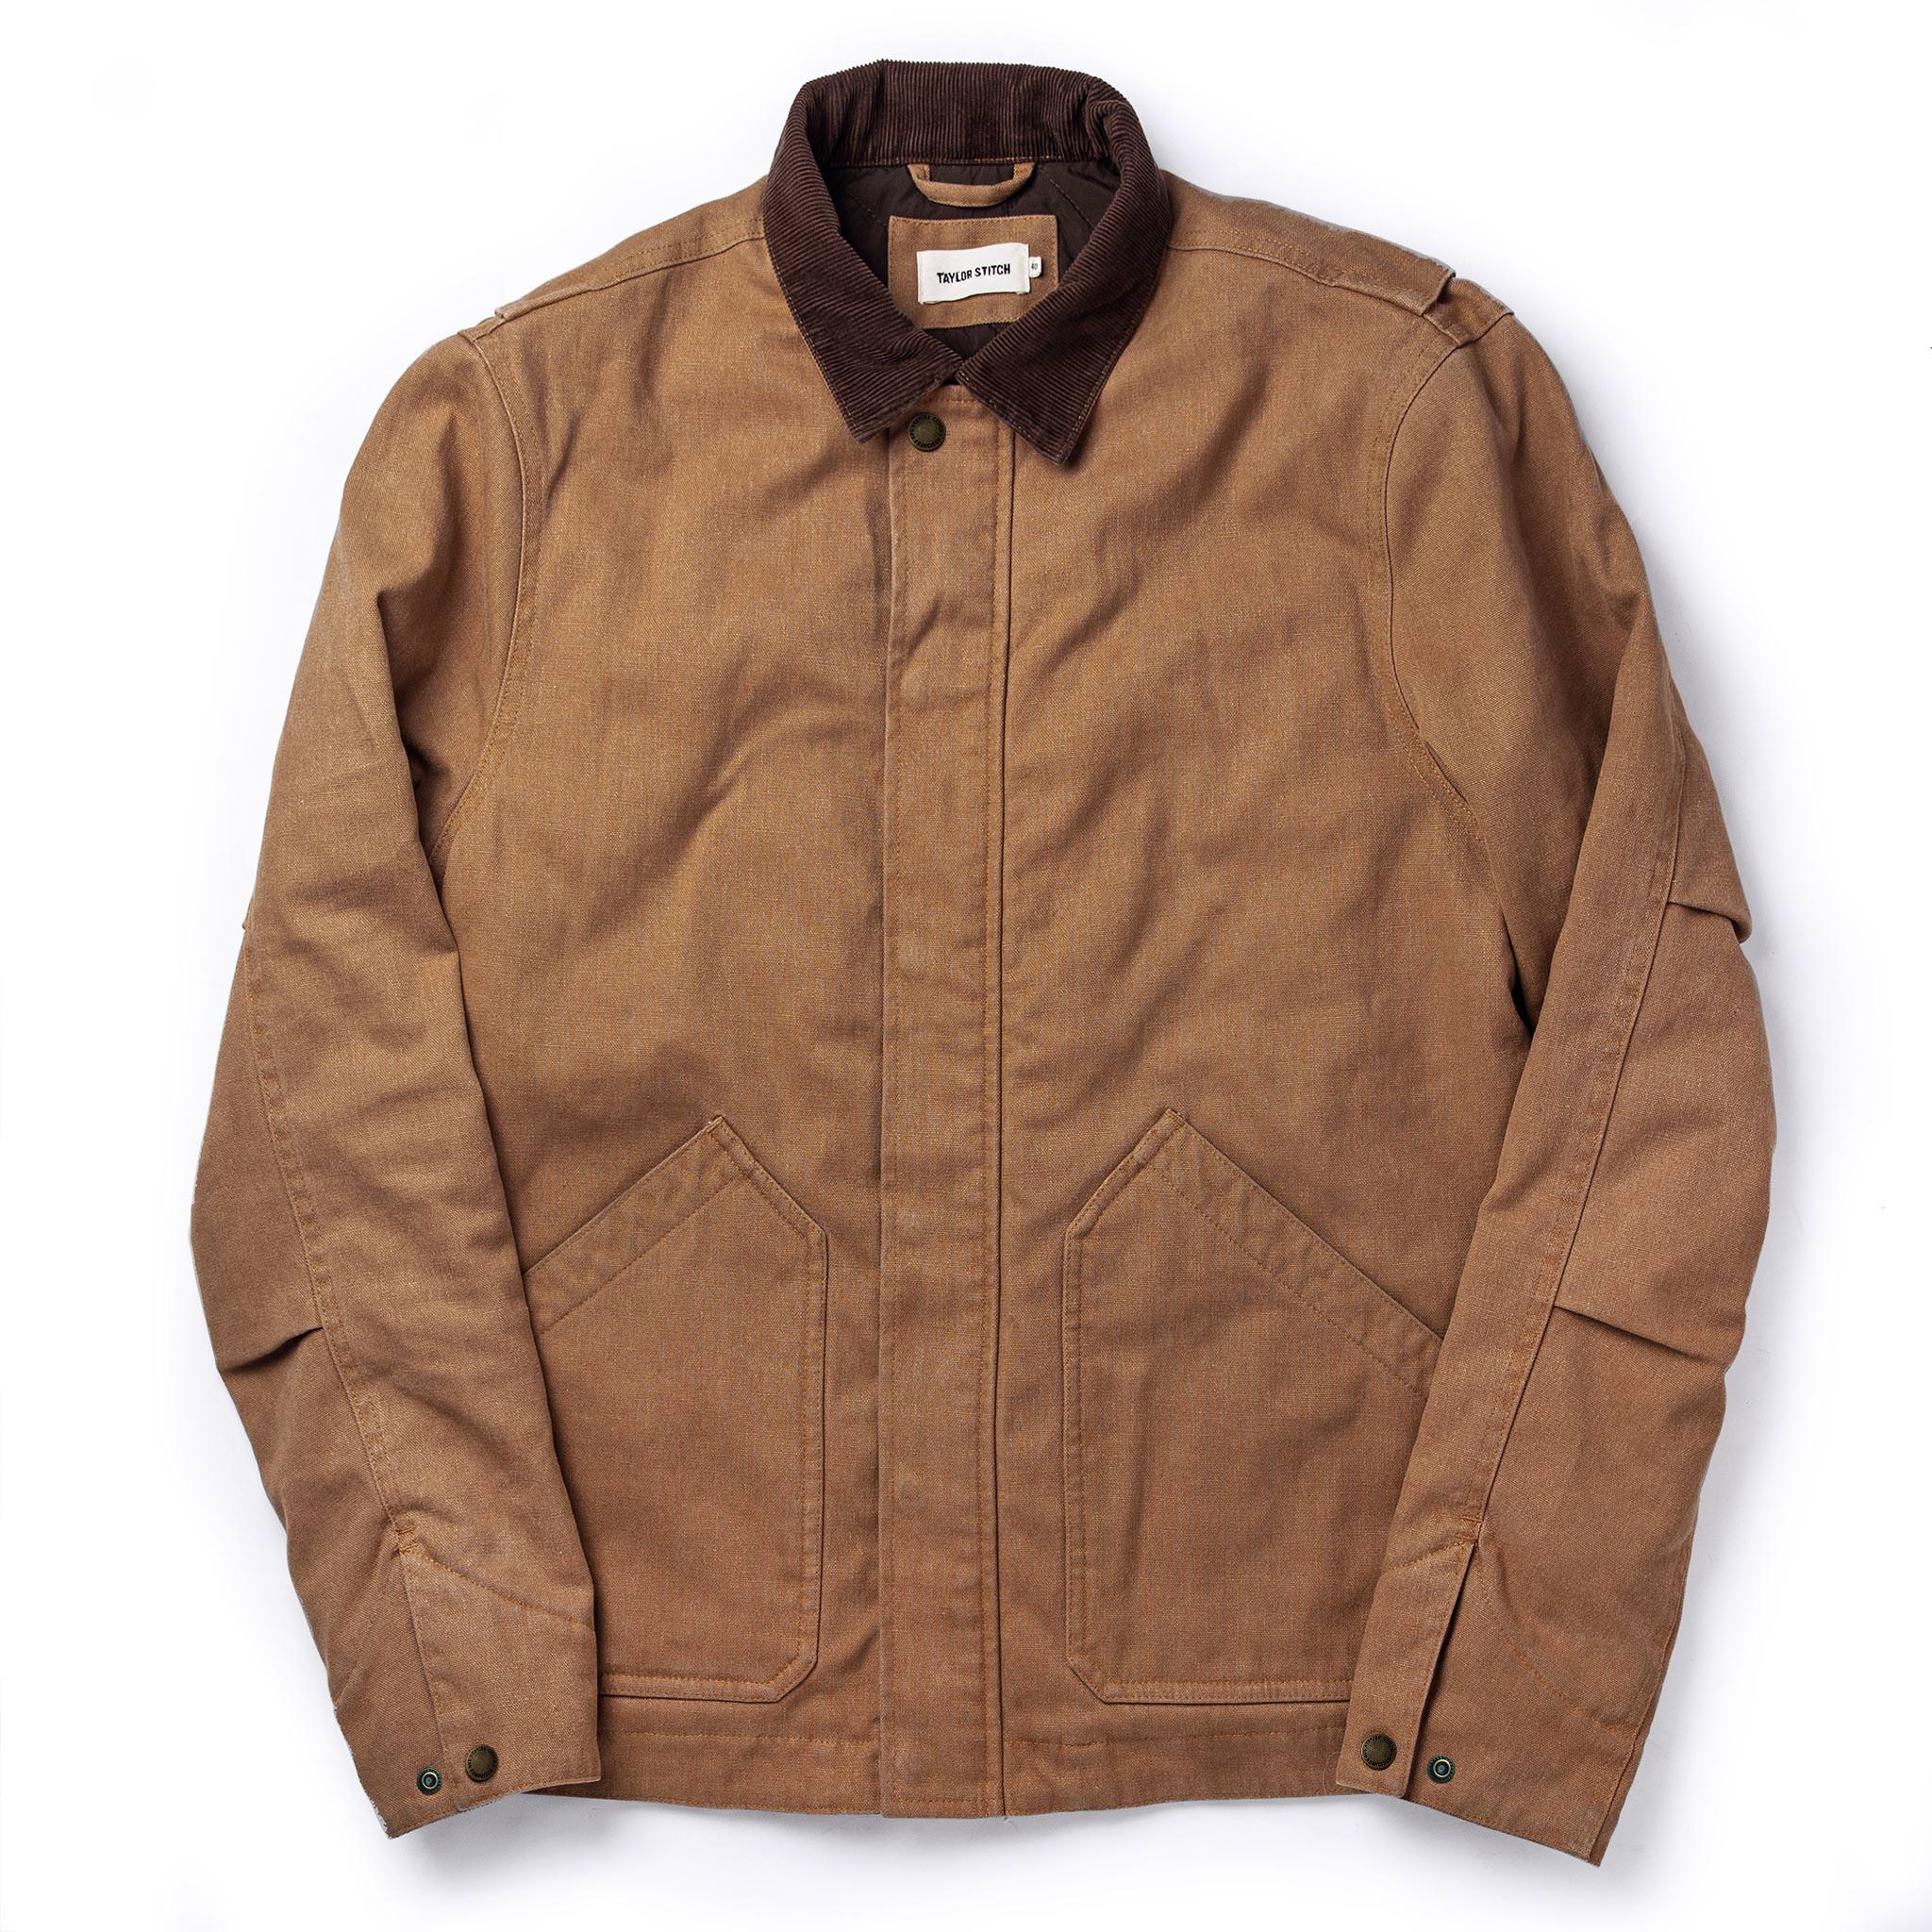 Taylor Stitch Workhorse Jacket